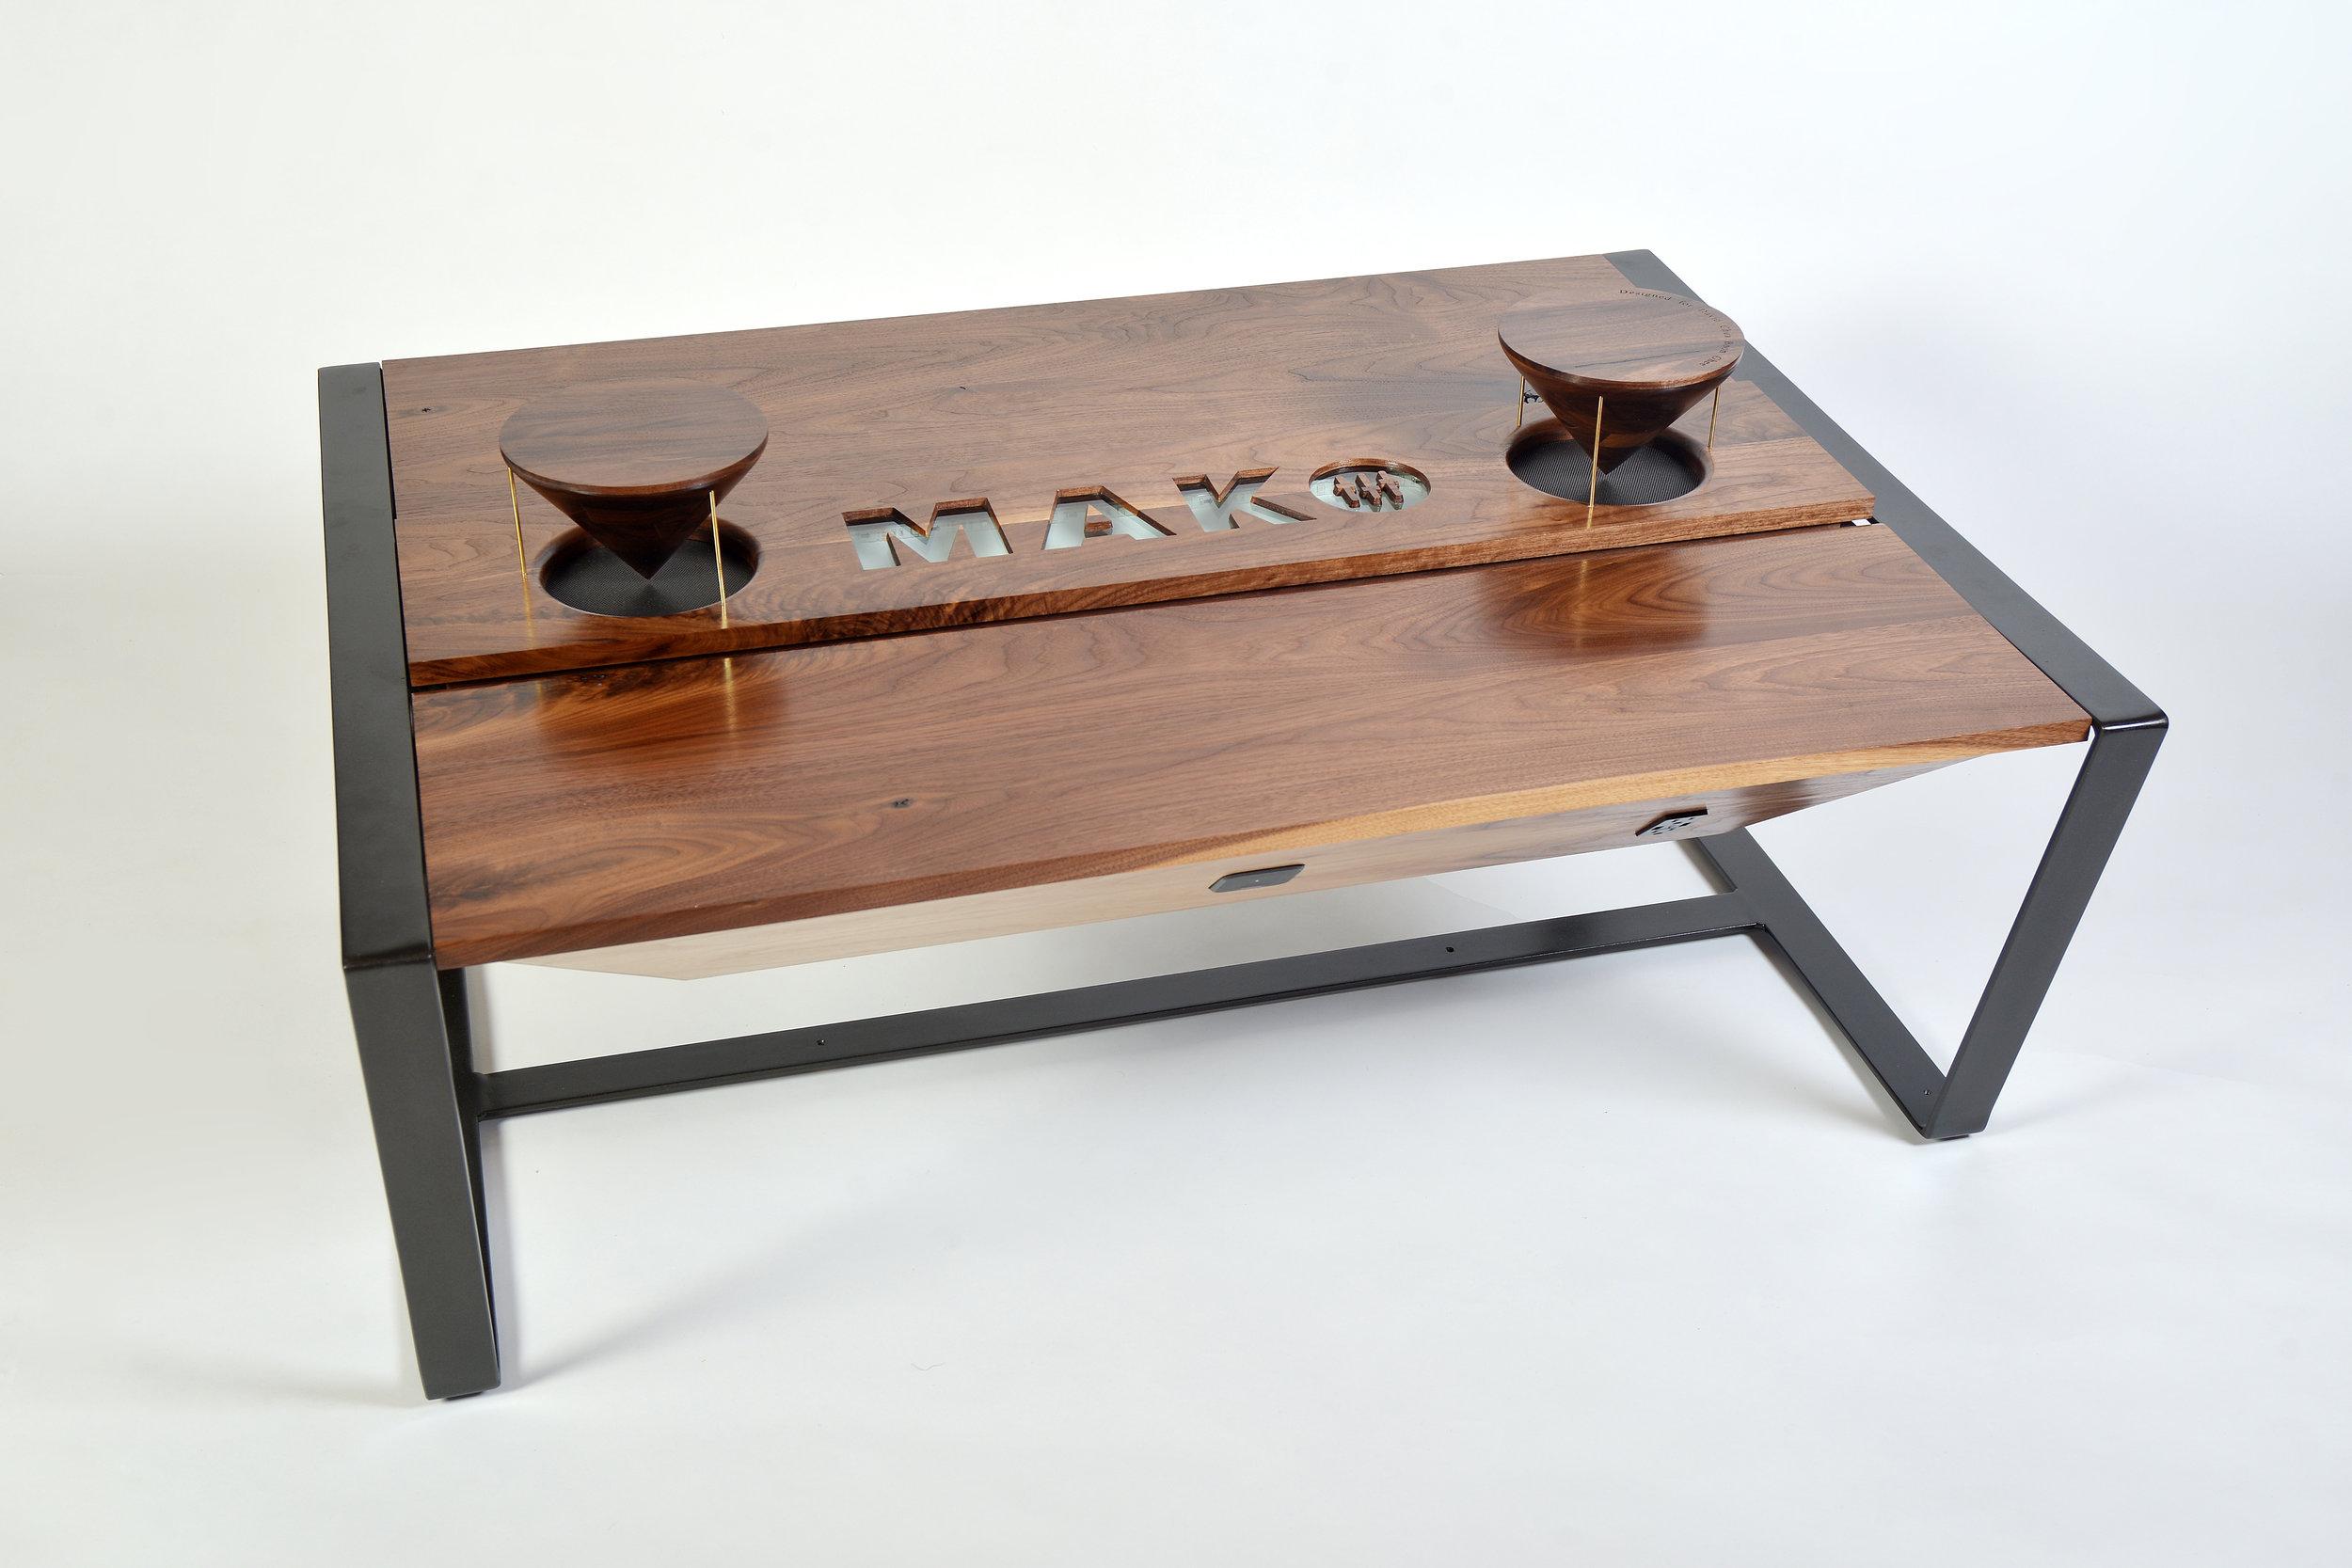 mako-custom-coffee-table-3